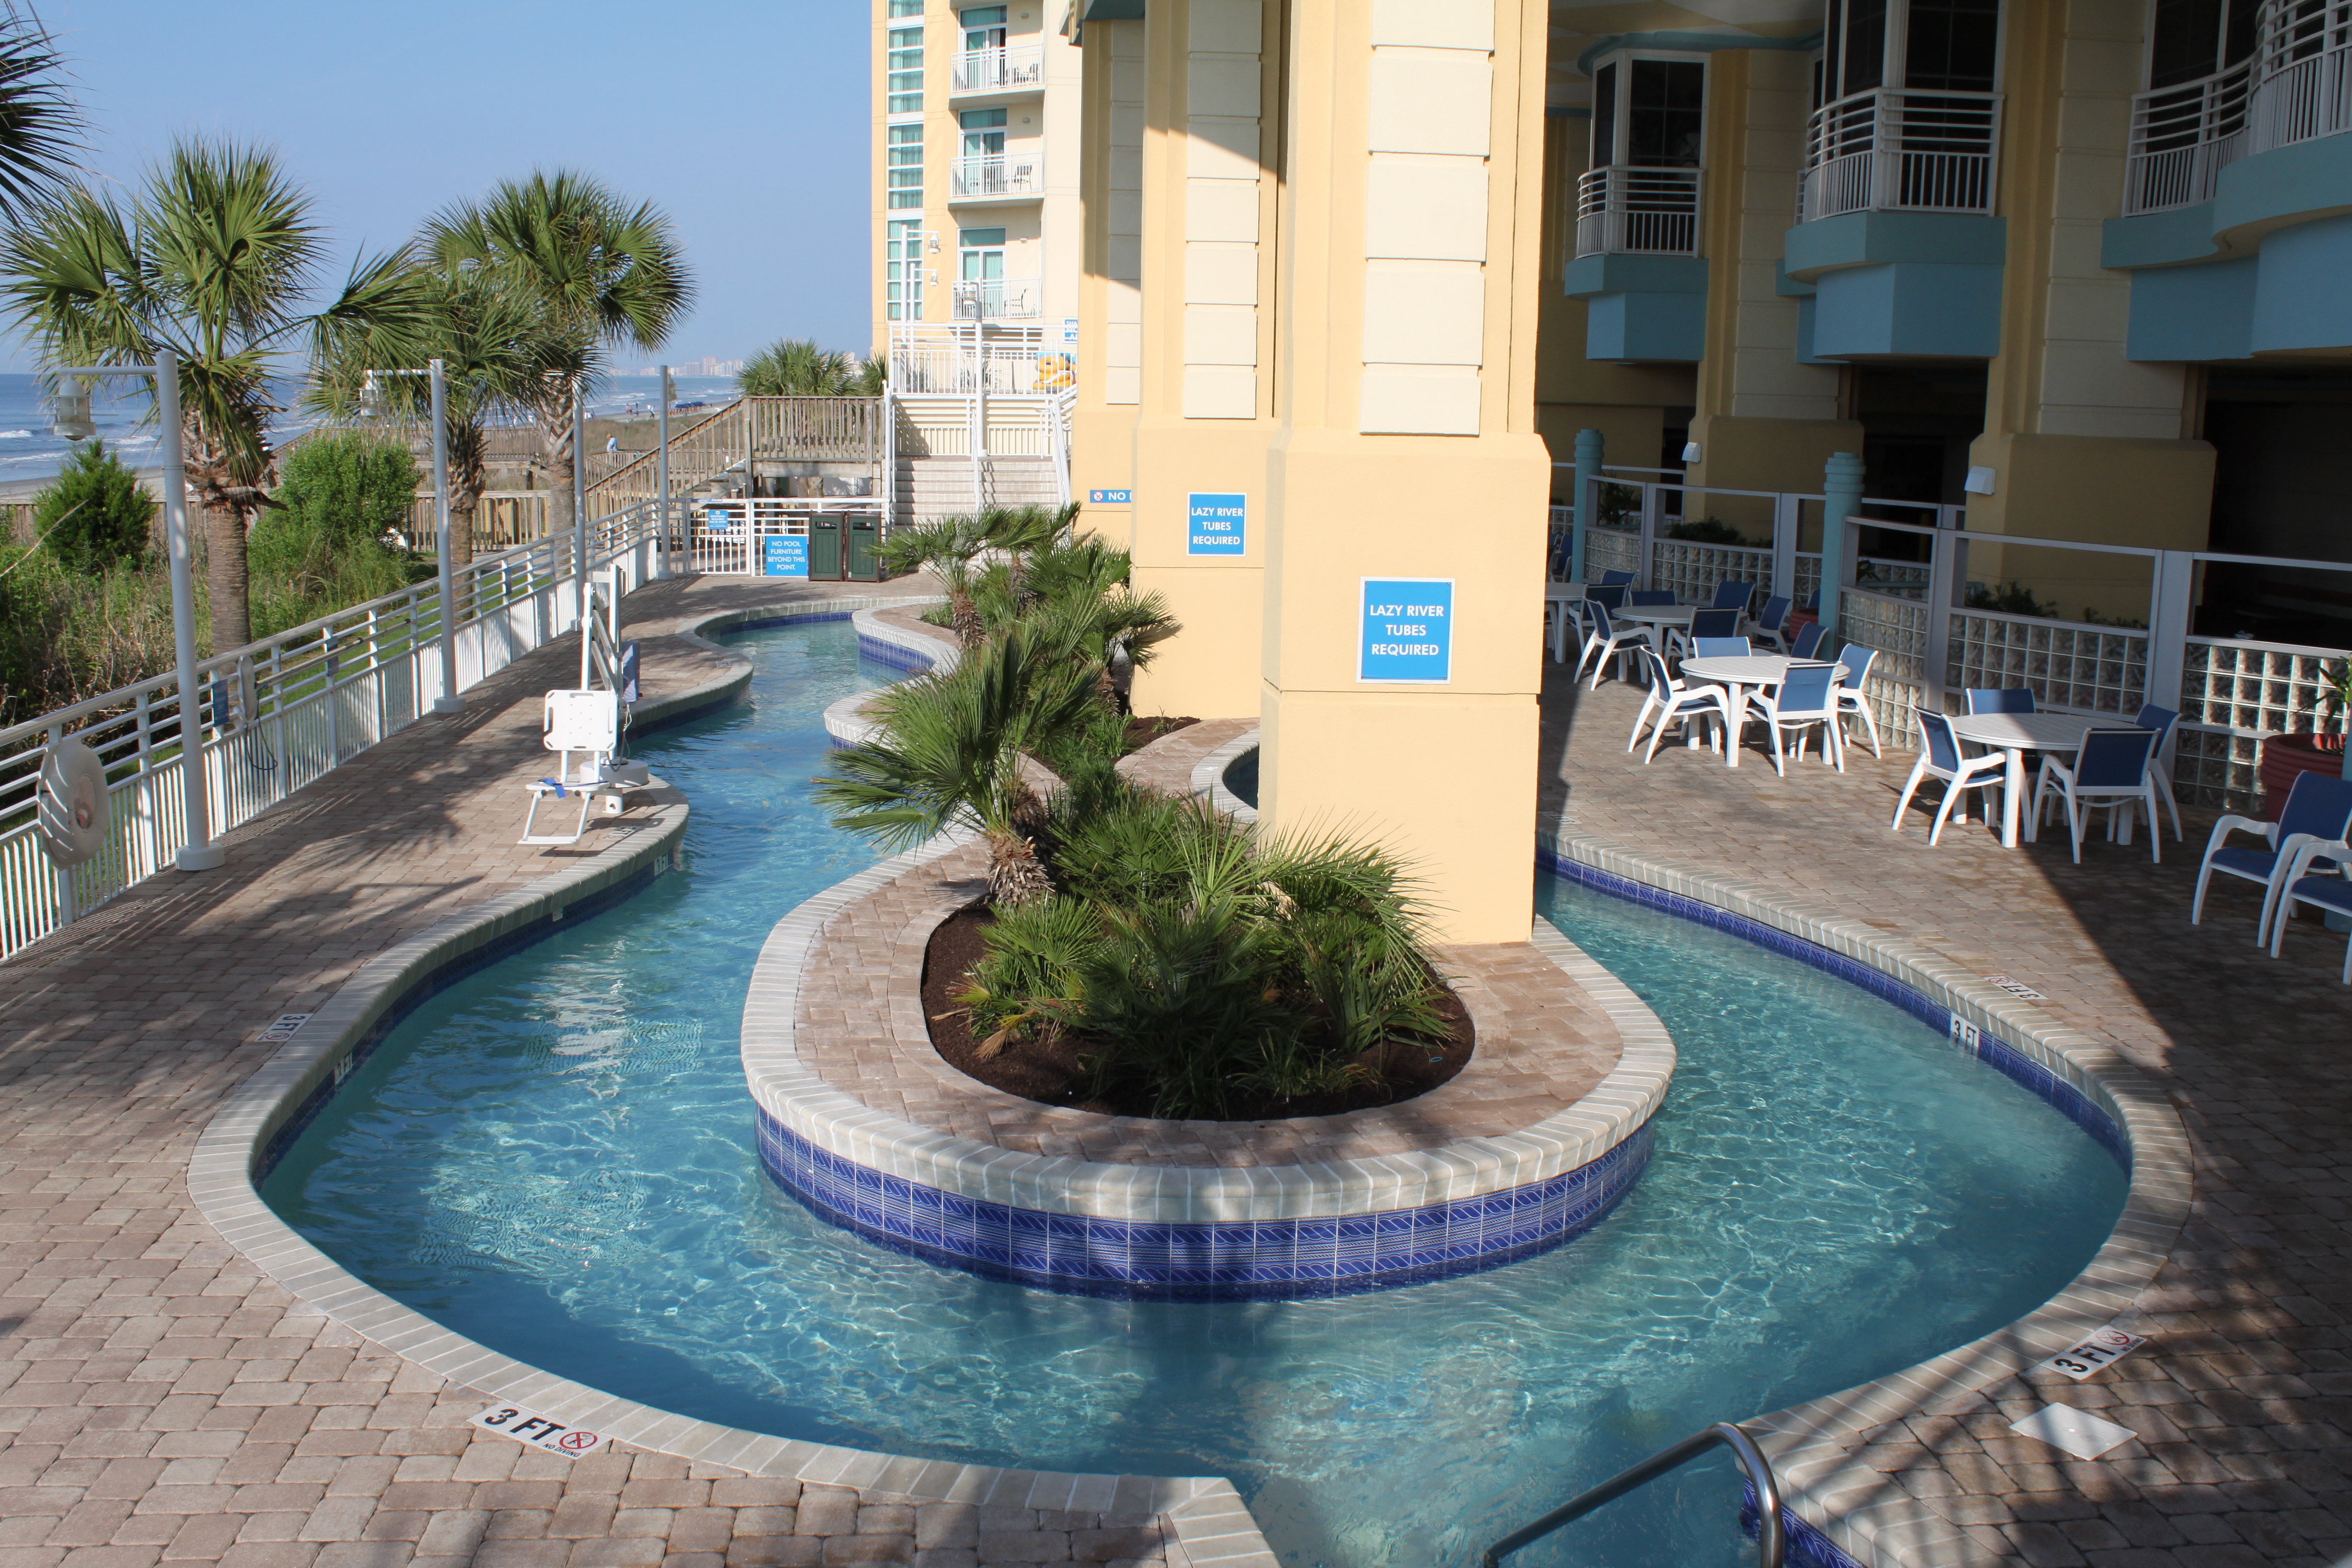 100 myrtle beach 3 bedroom hotels suite hotels in aruba myrtle beach 3 bedroom hotels tripbound blog